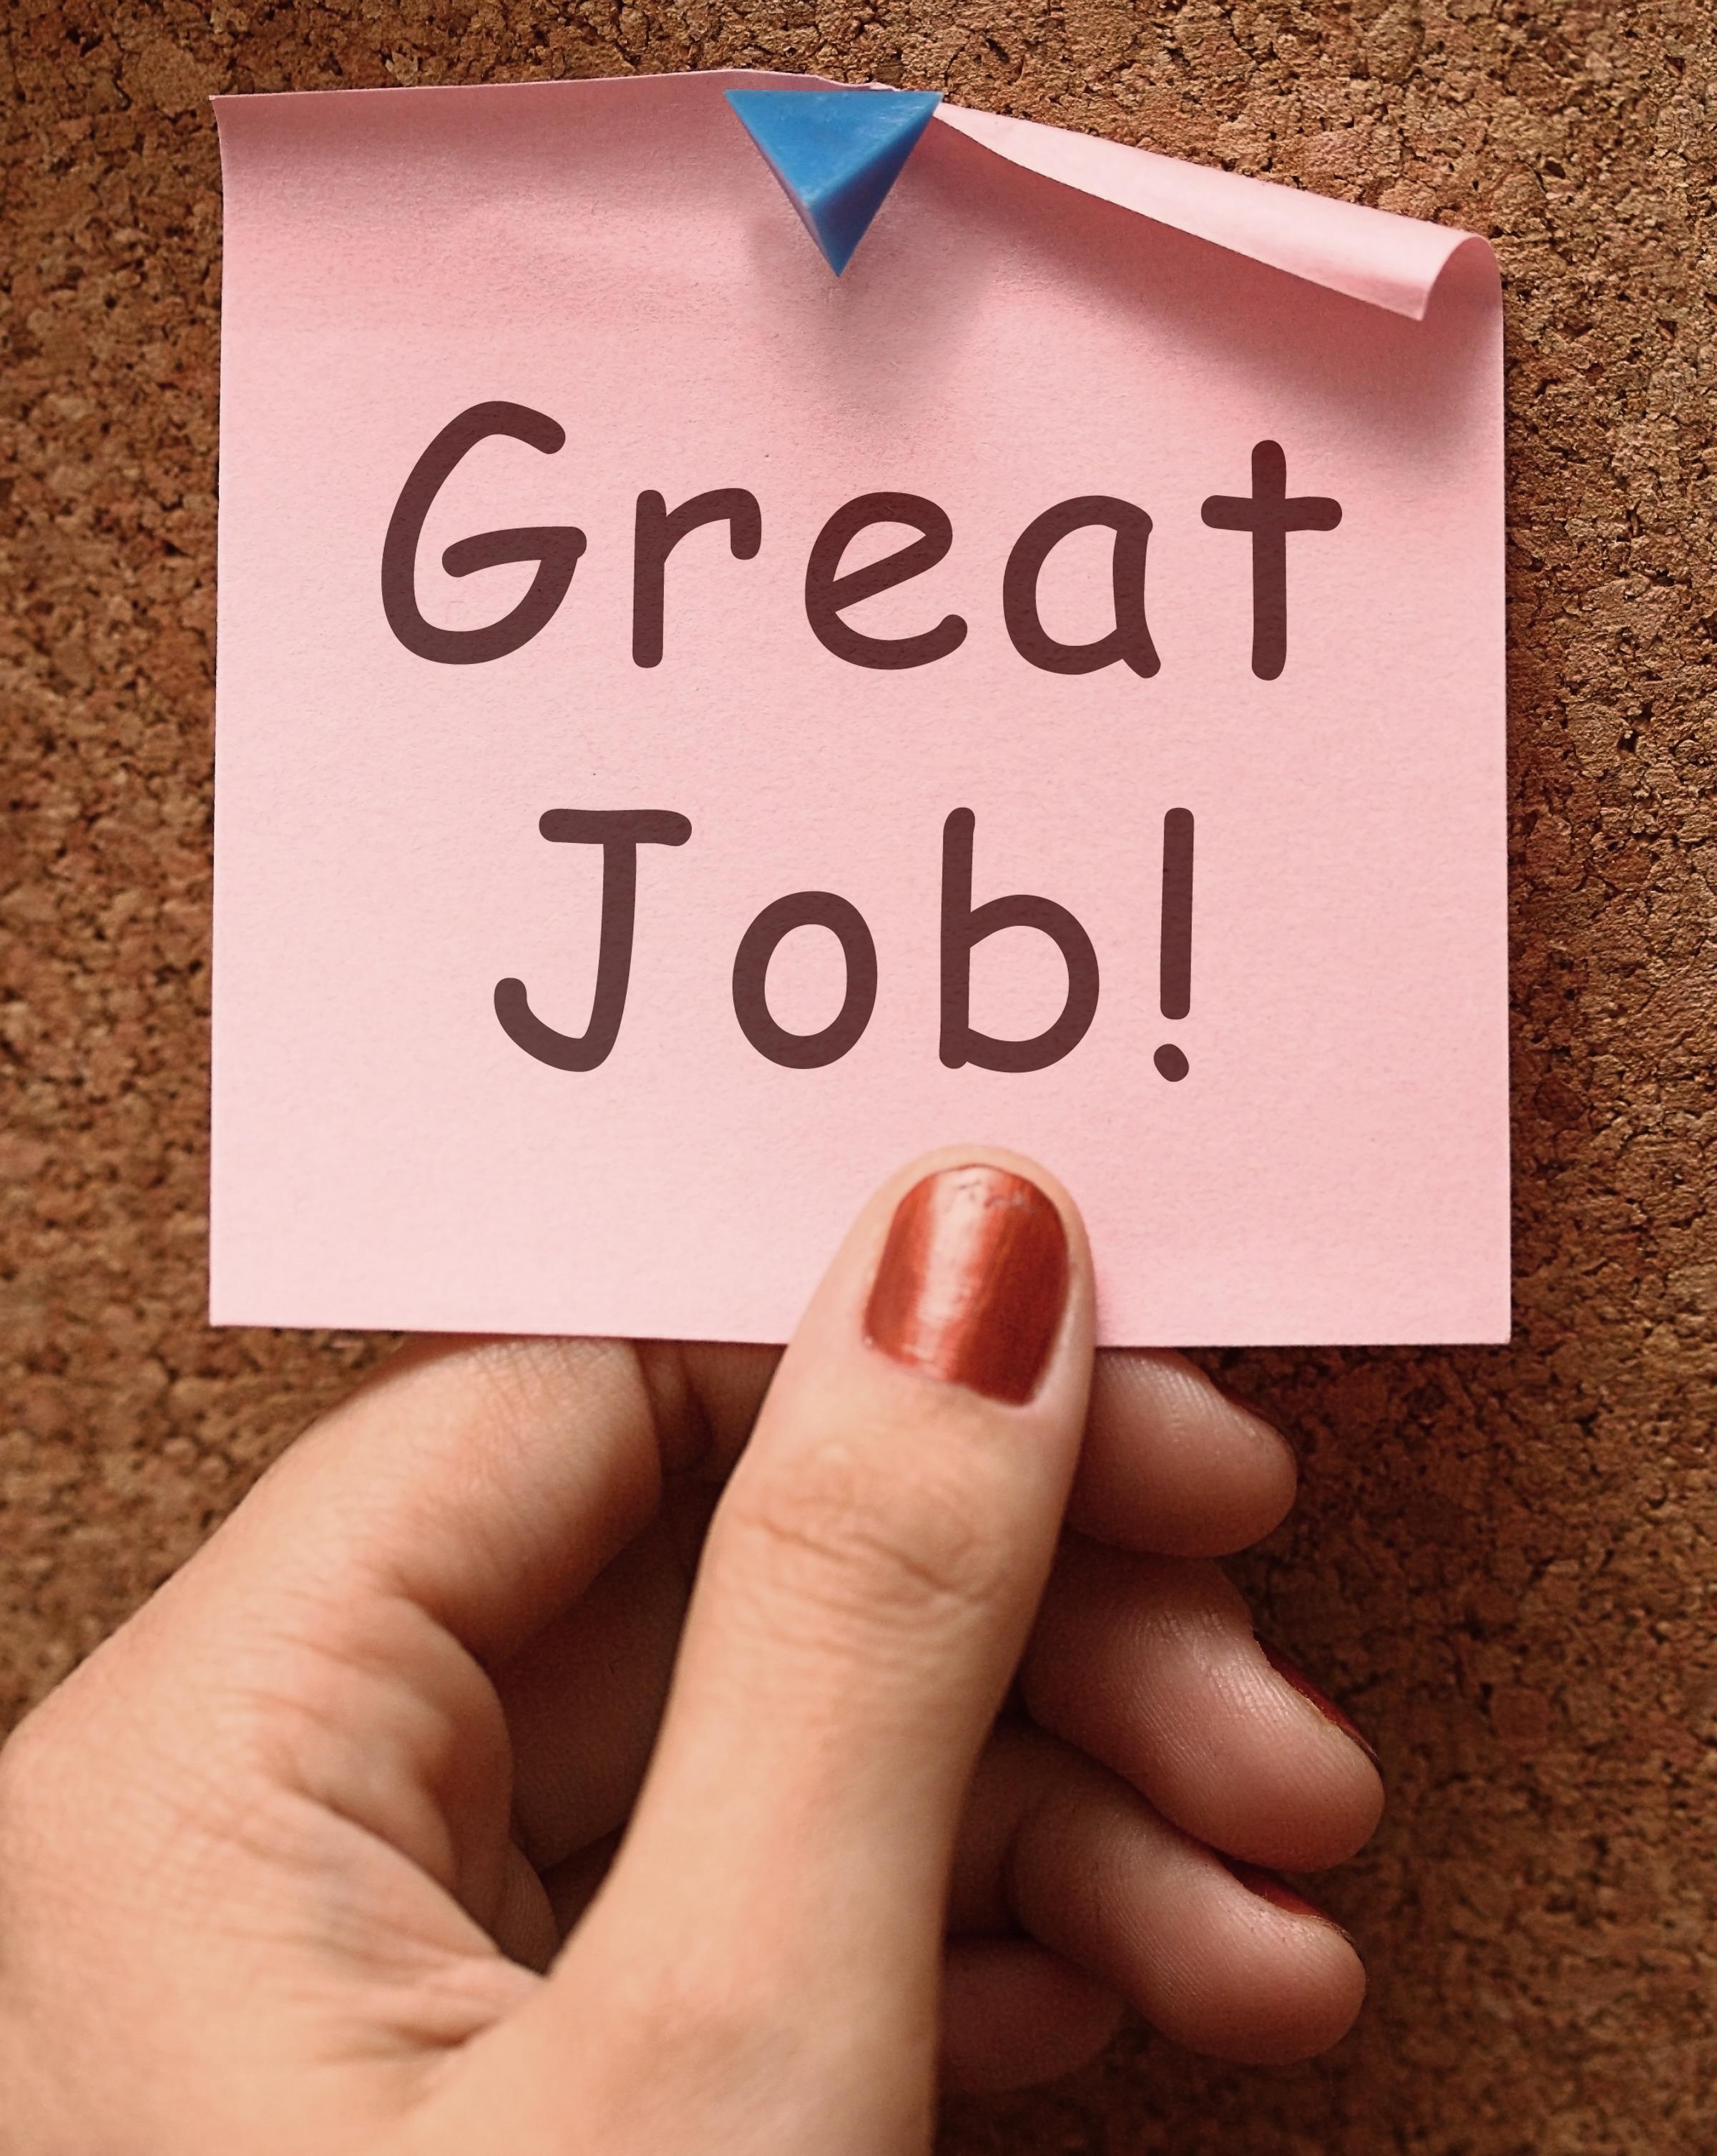 Employee Appreciation Day - March 3rd